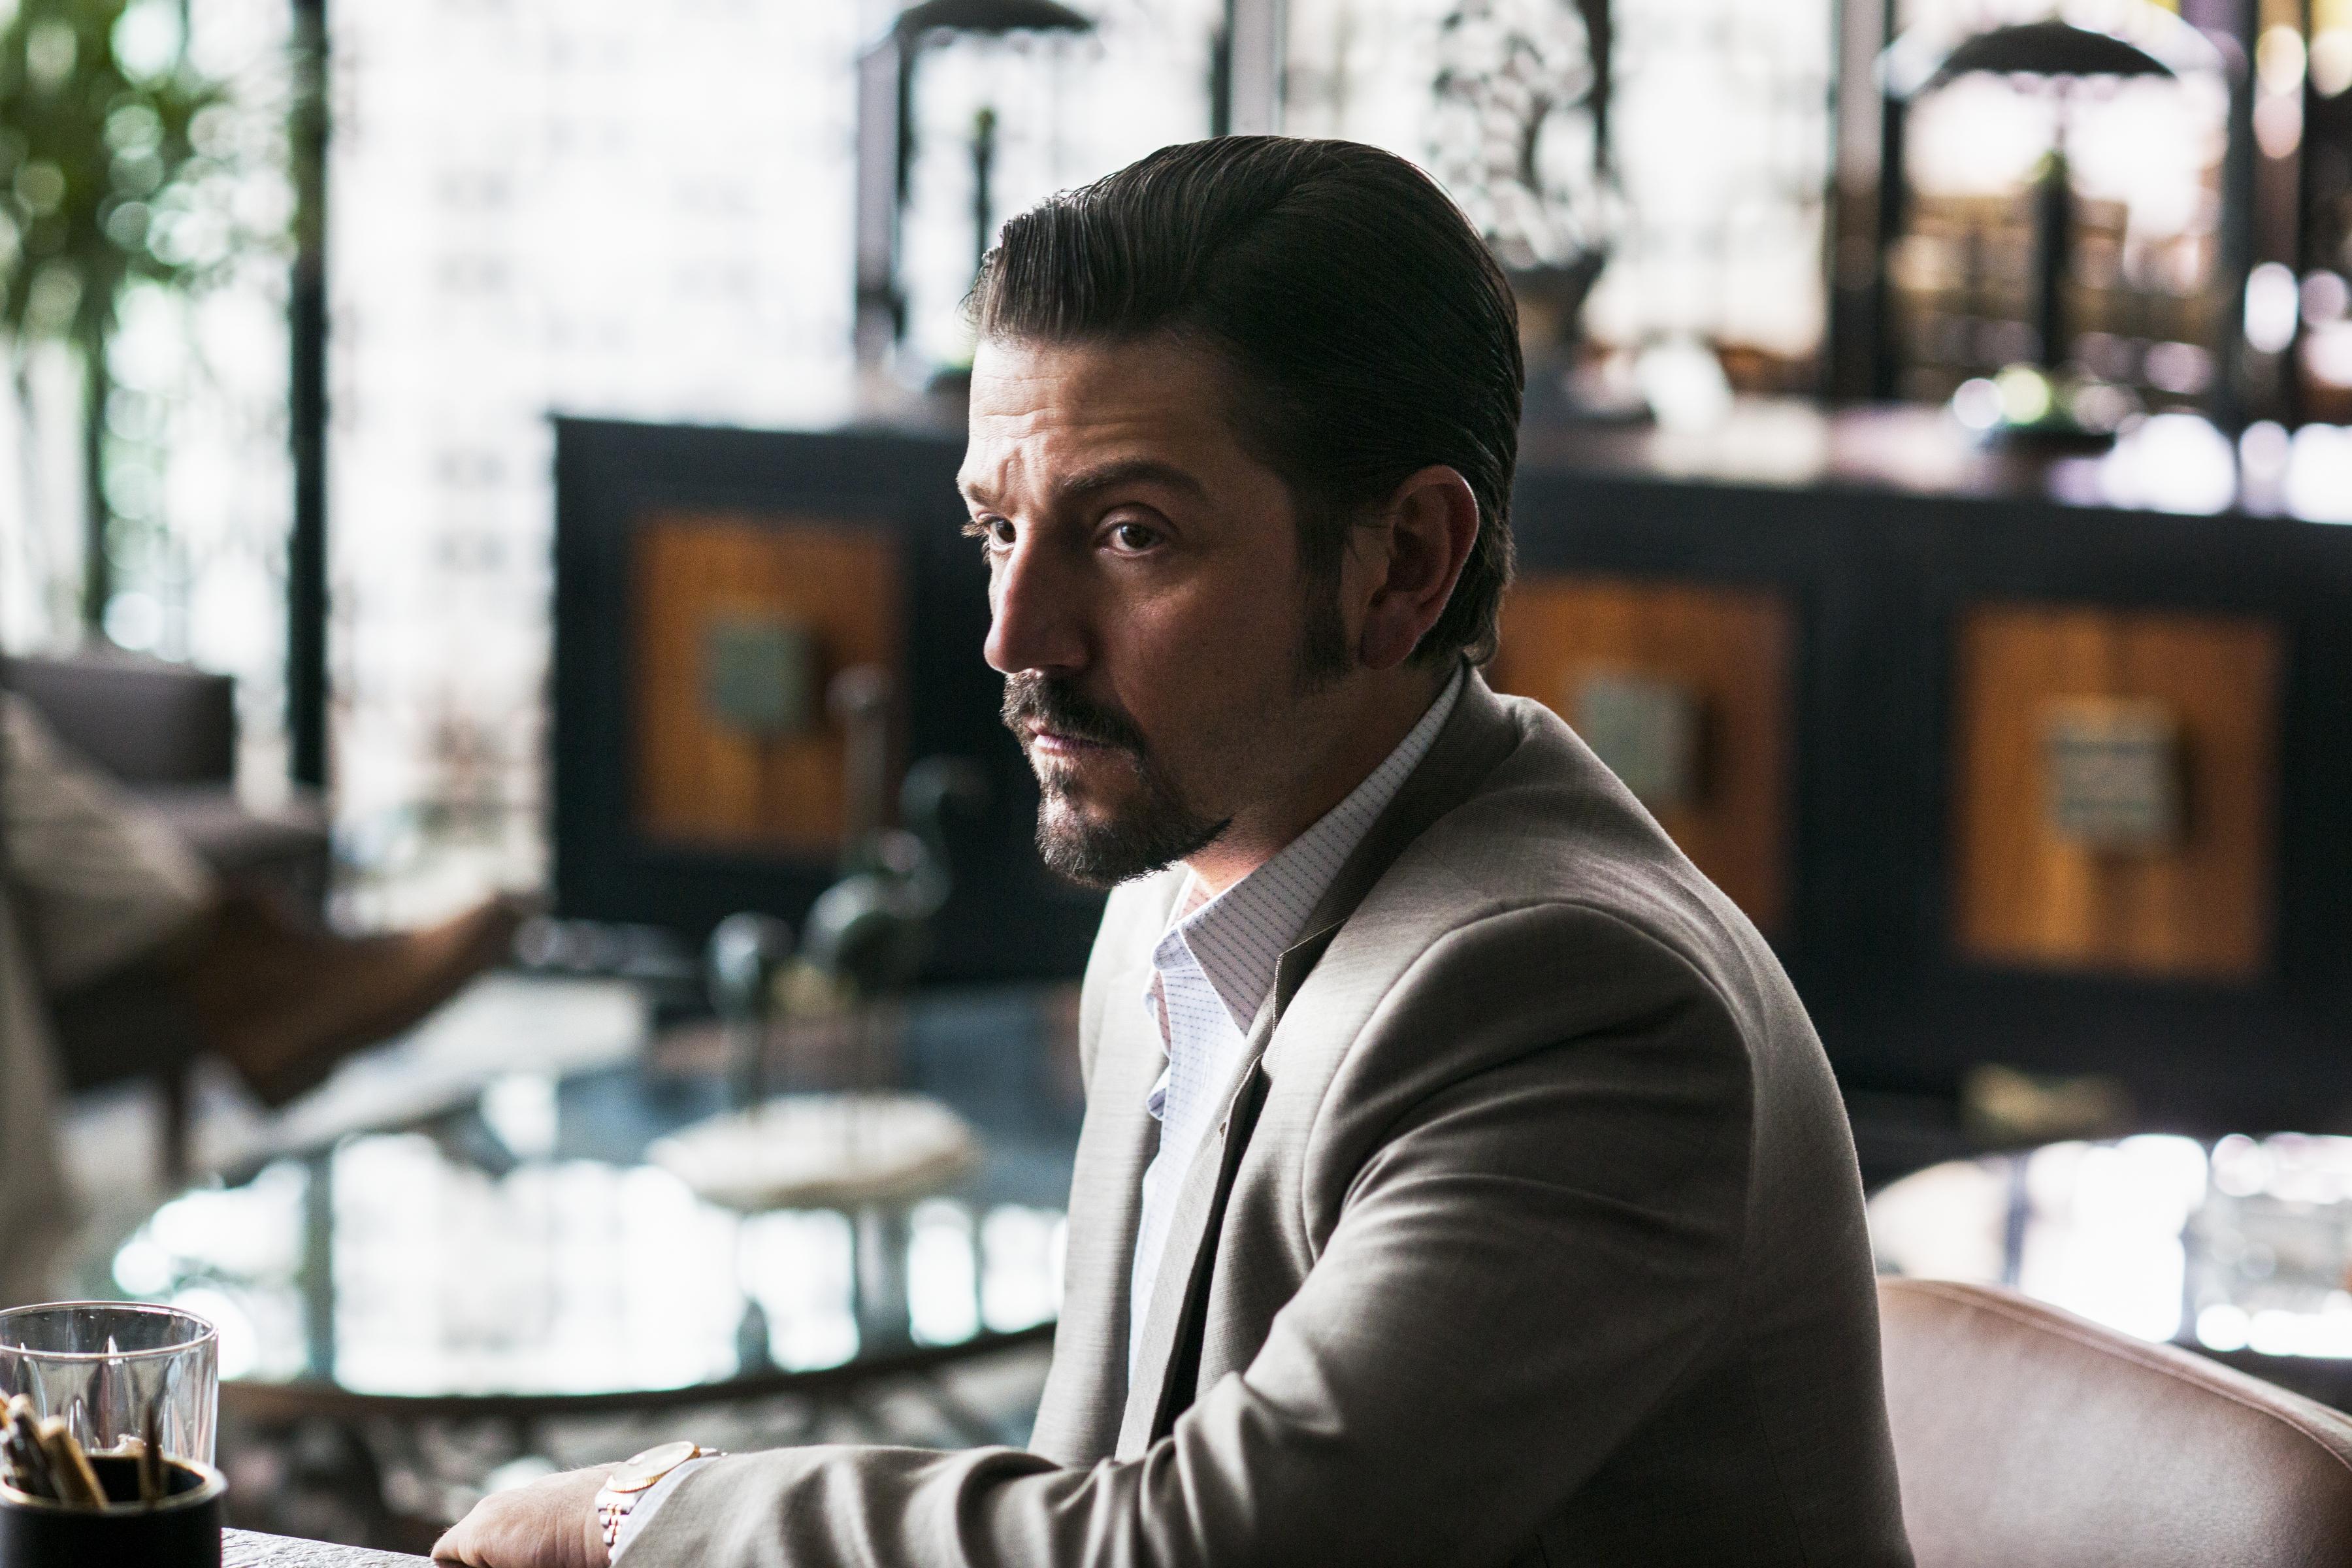 'Narcos: Mexico' Stars Diego Luna as a Founder of the Guadalajara Cartel